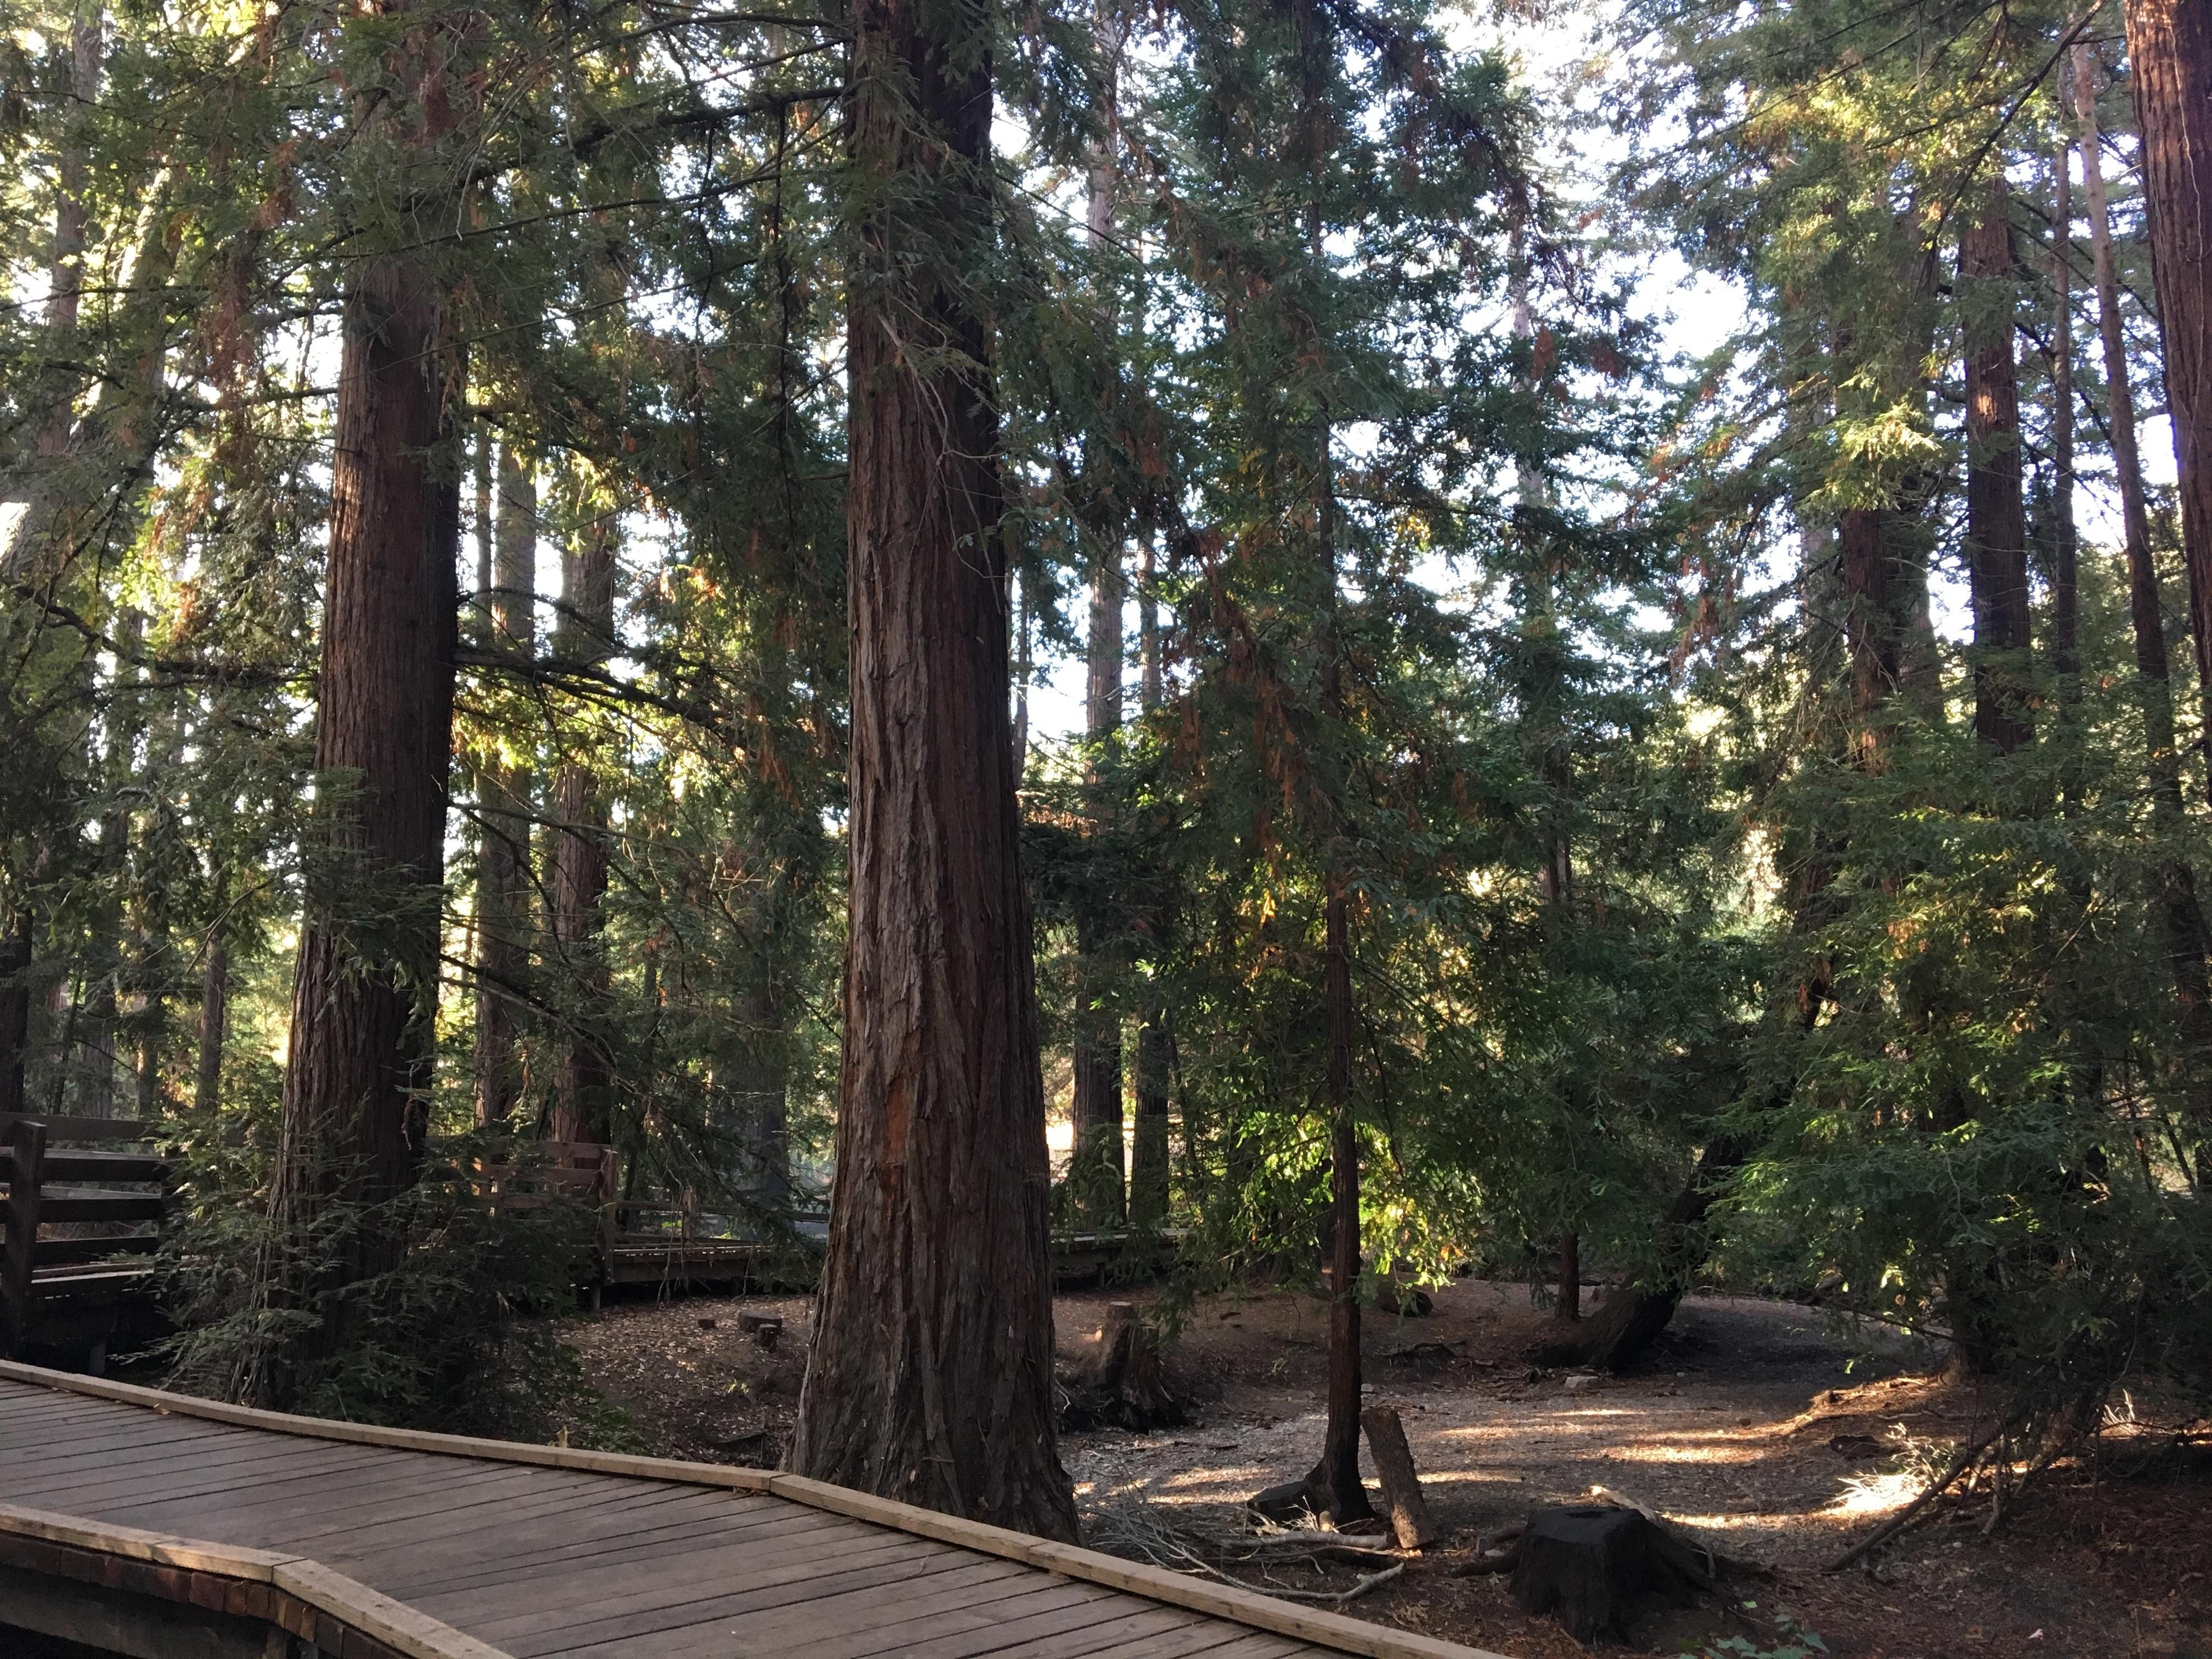 Volunteer Outdoors in Los Altos: Sorrel Saturdays at Redwood Grove